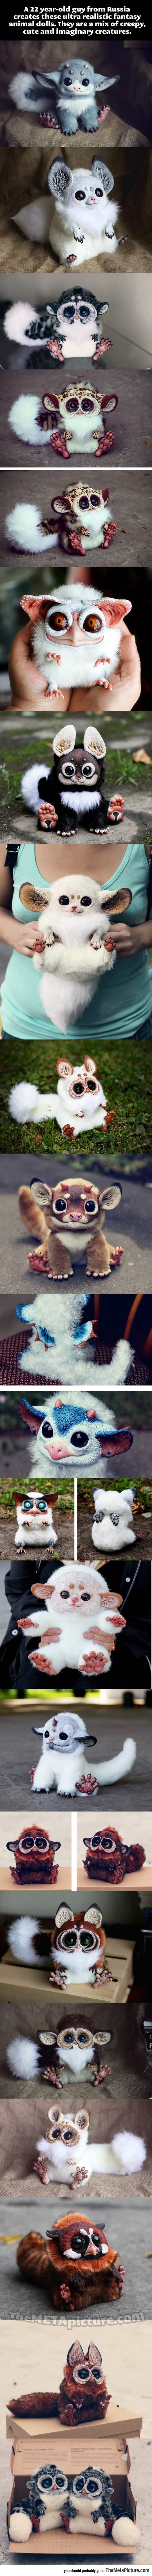 Realistic Fantasy Animal Dolls